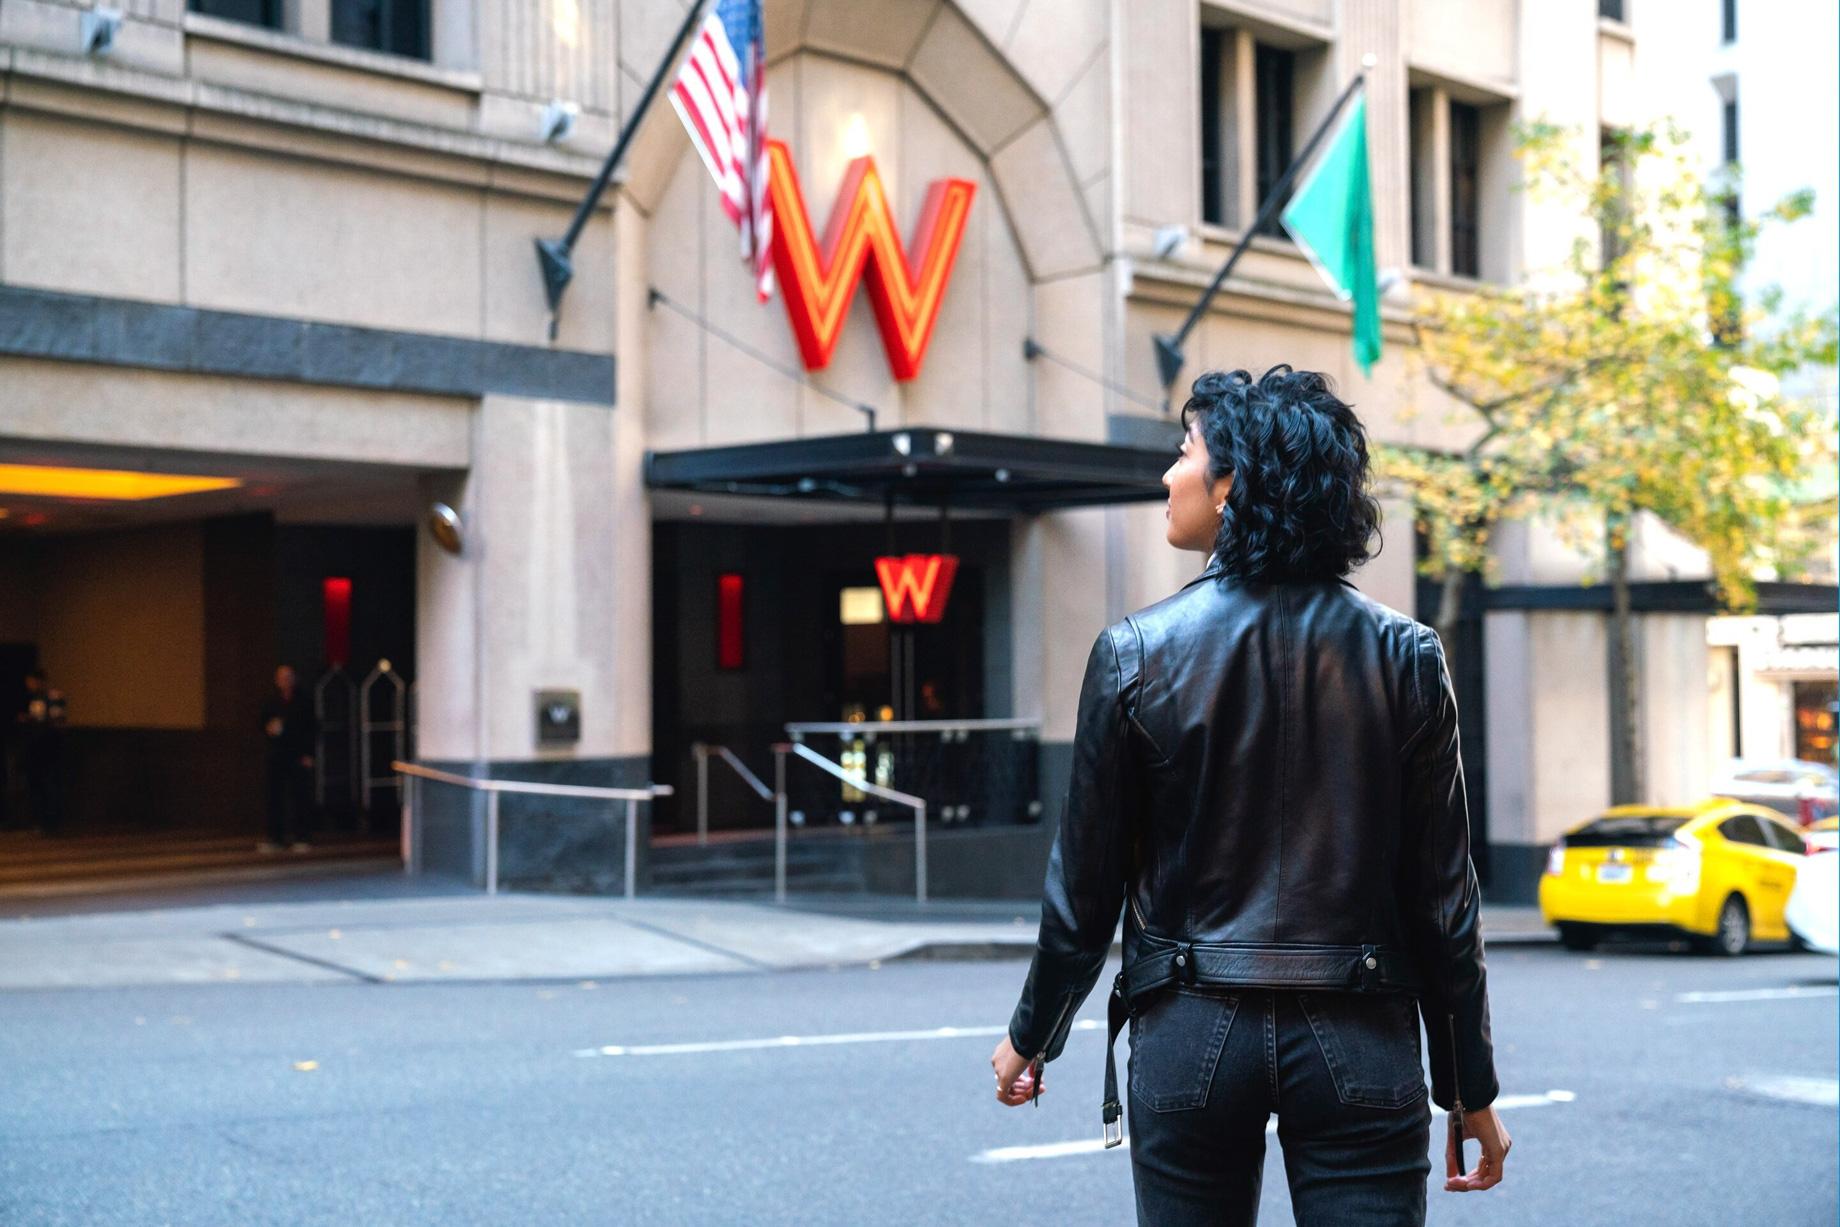 W Seattle Luxury Hotel - Seattle, WA, USA - Hotel Exterior